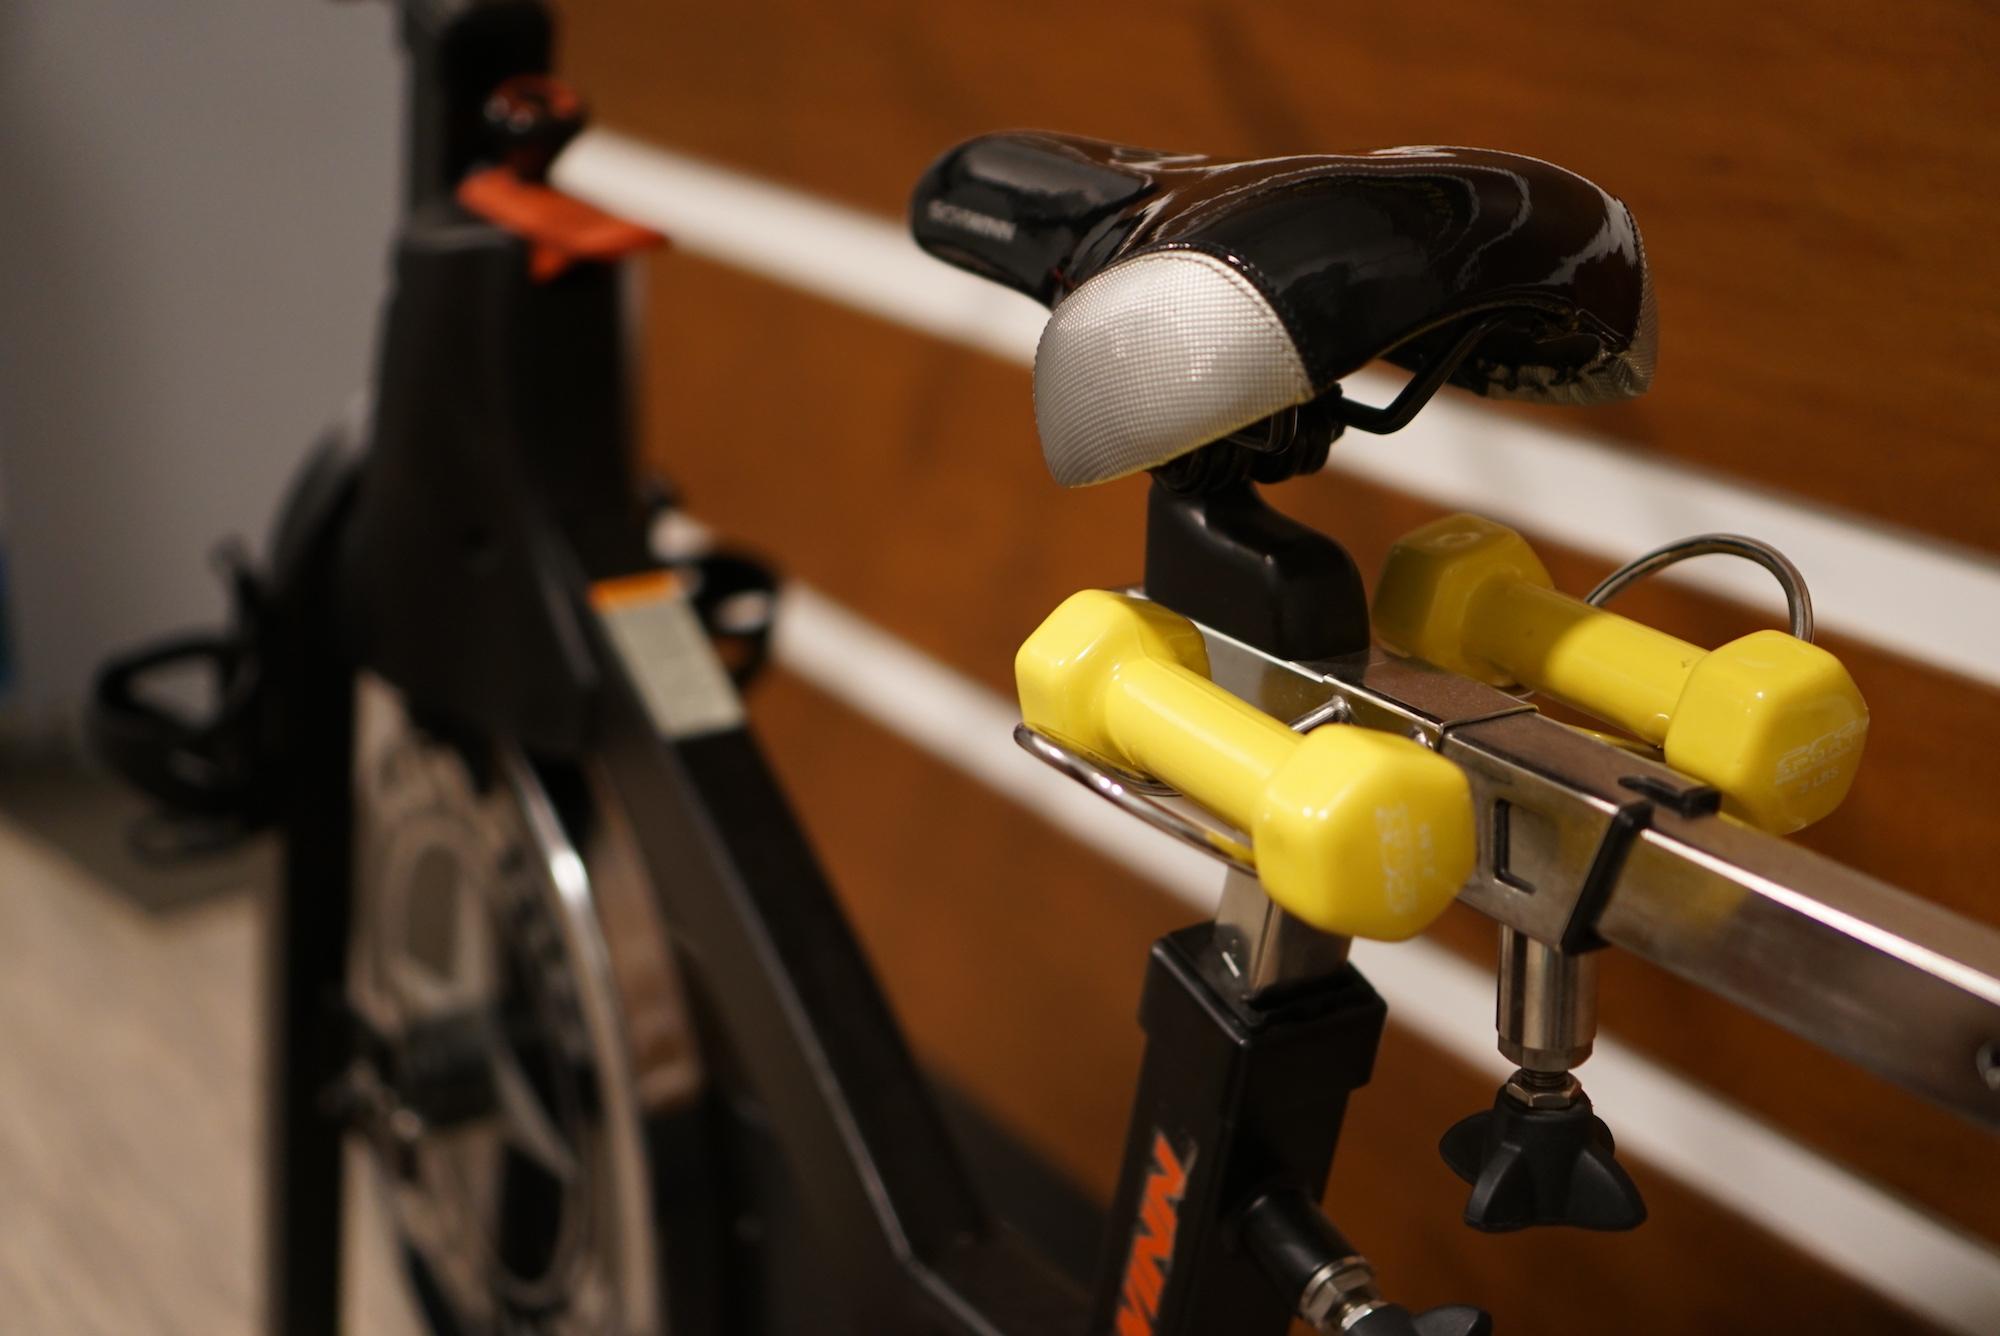 Schwinn Bikes at CycleHouse Indoor Cycling